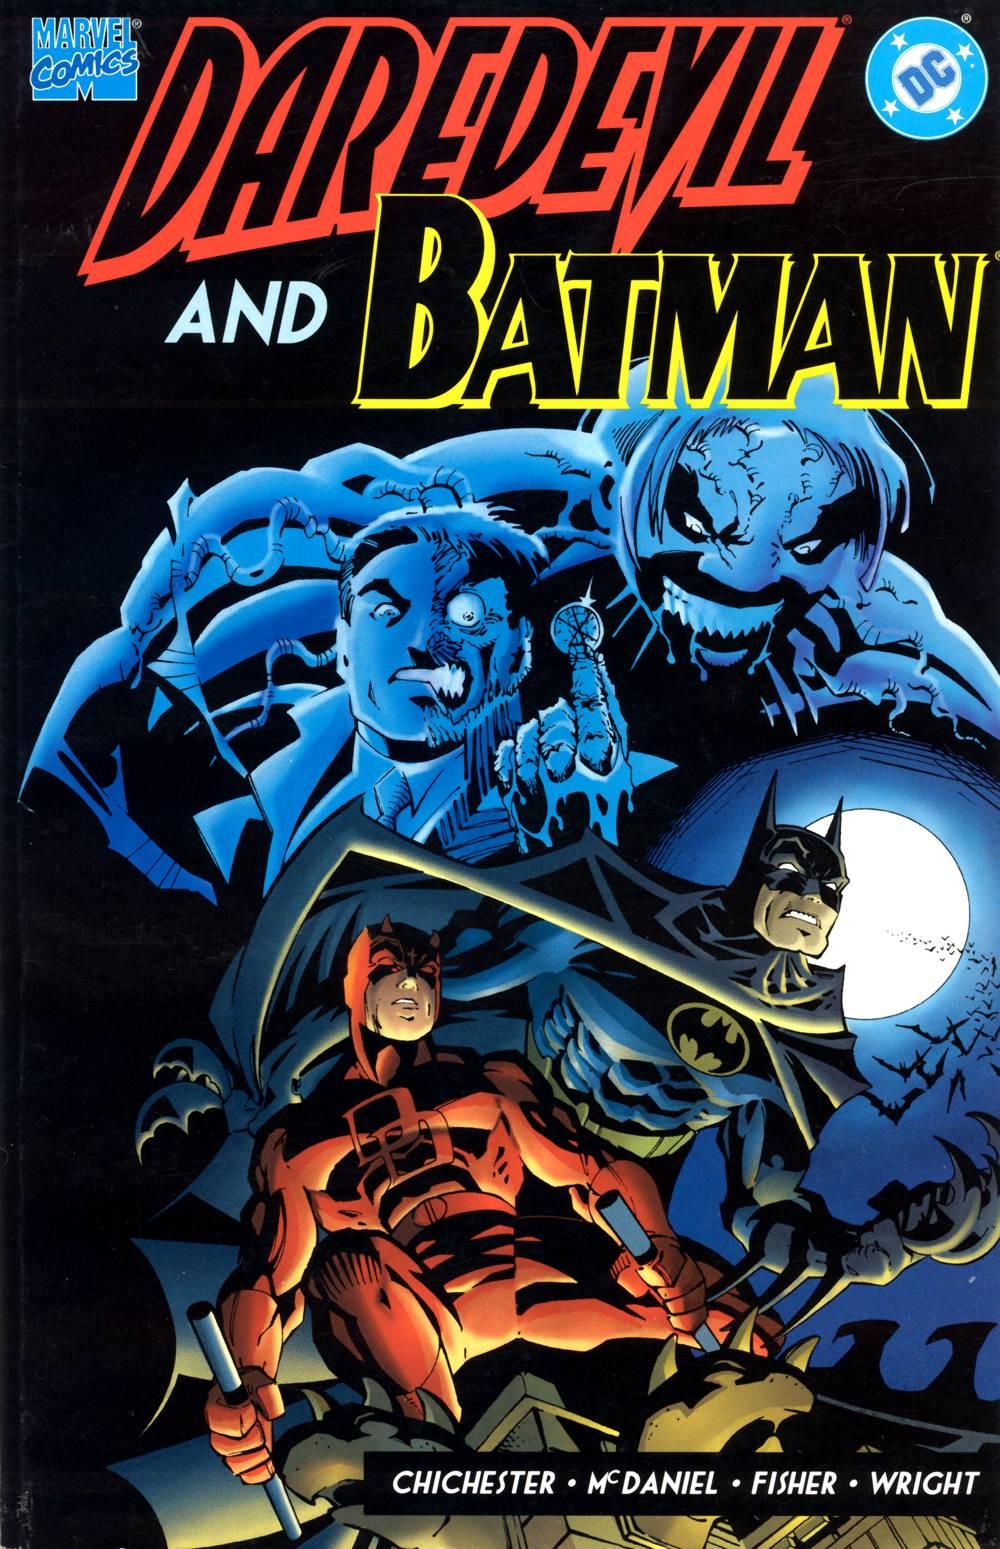 File:Daredevil Batman Vol 1 1.jpg